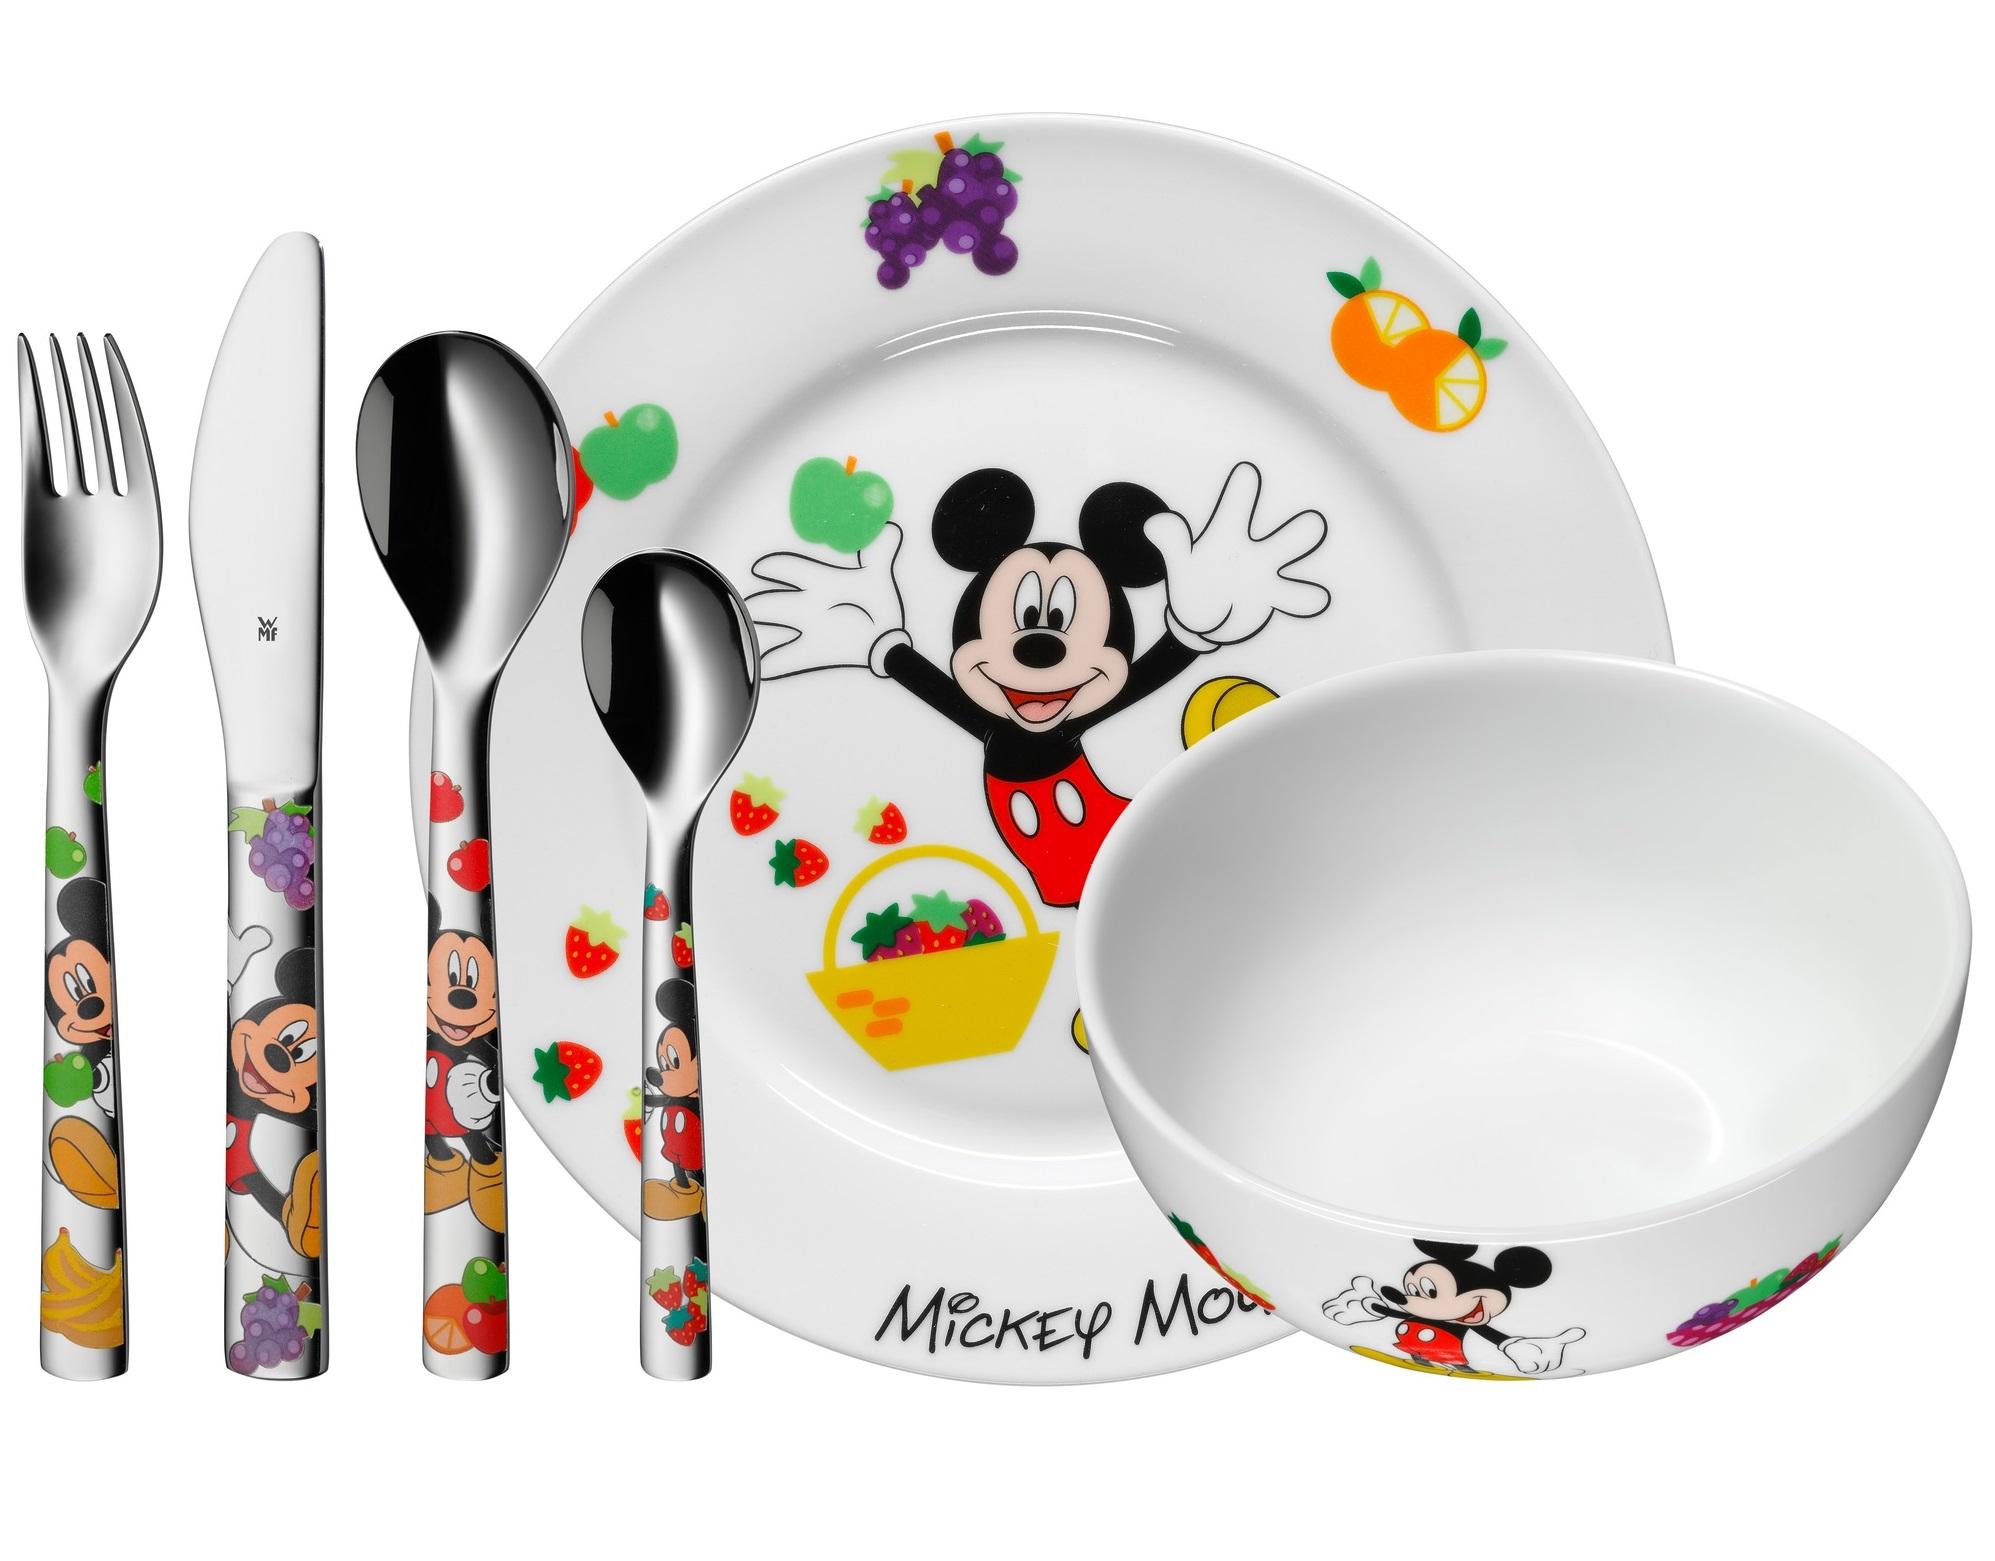 WMF Kinderbestek Kids Disney Mickey Mouse 6-Delig